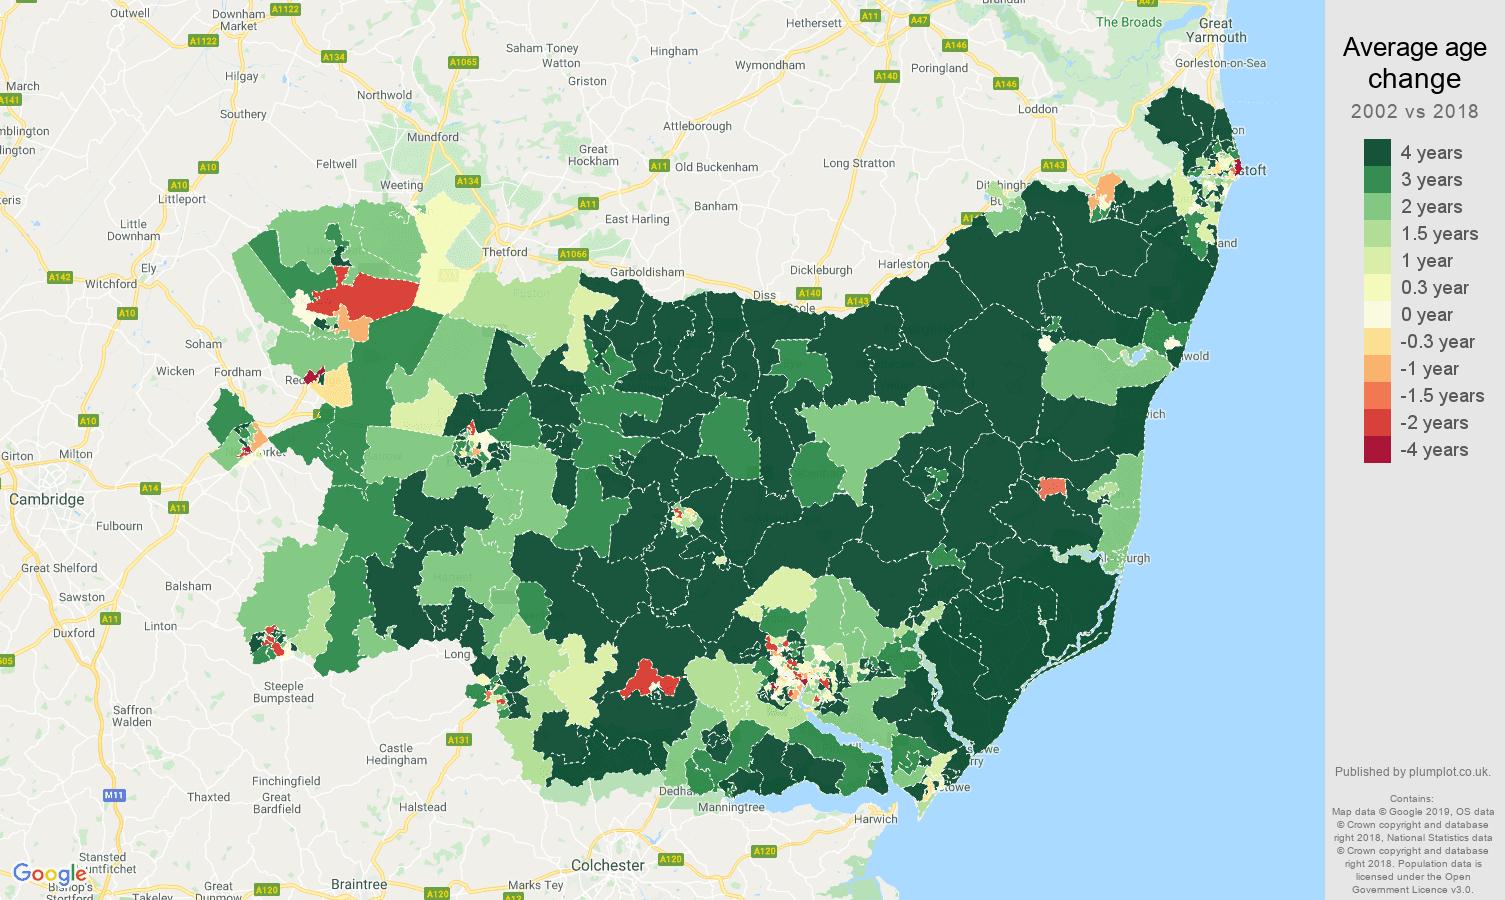 Suffolk average age change map